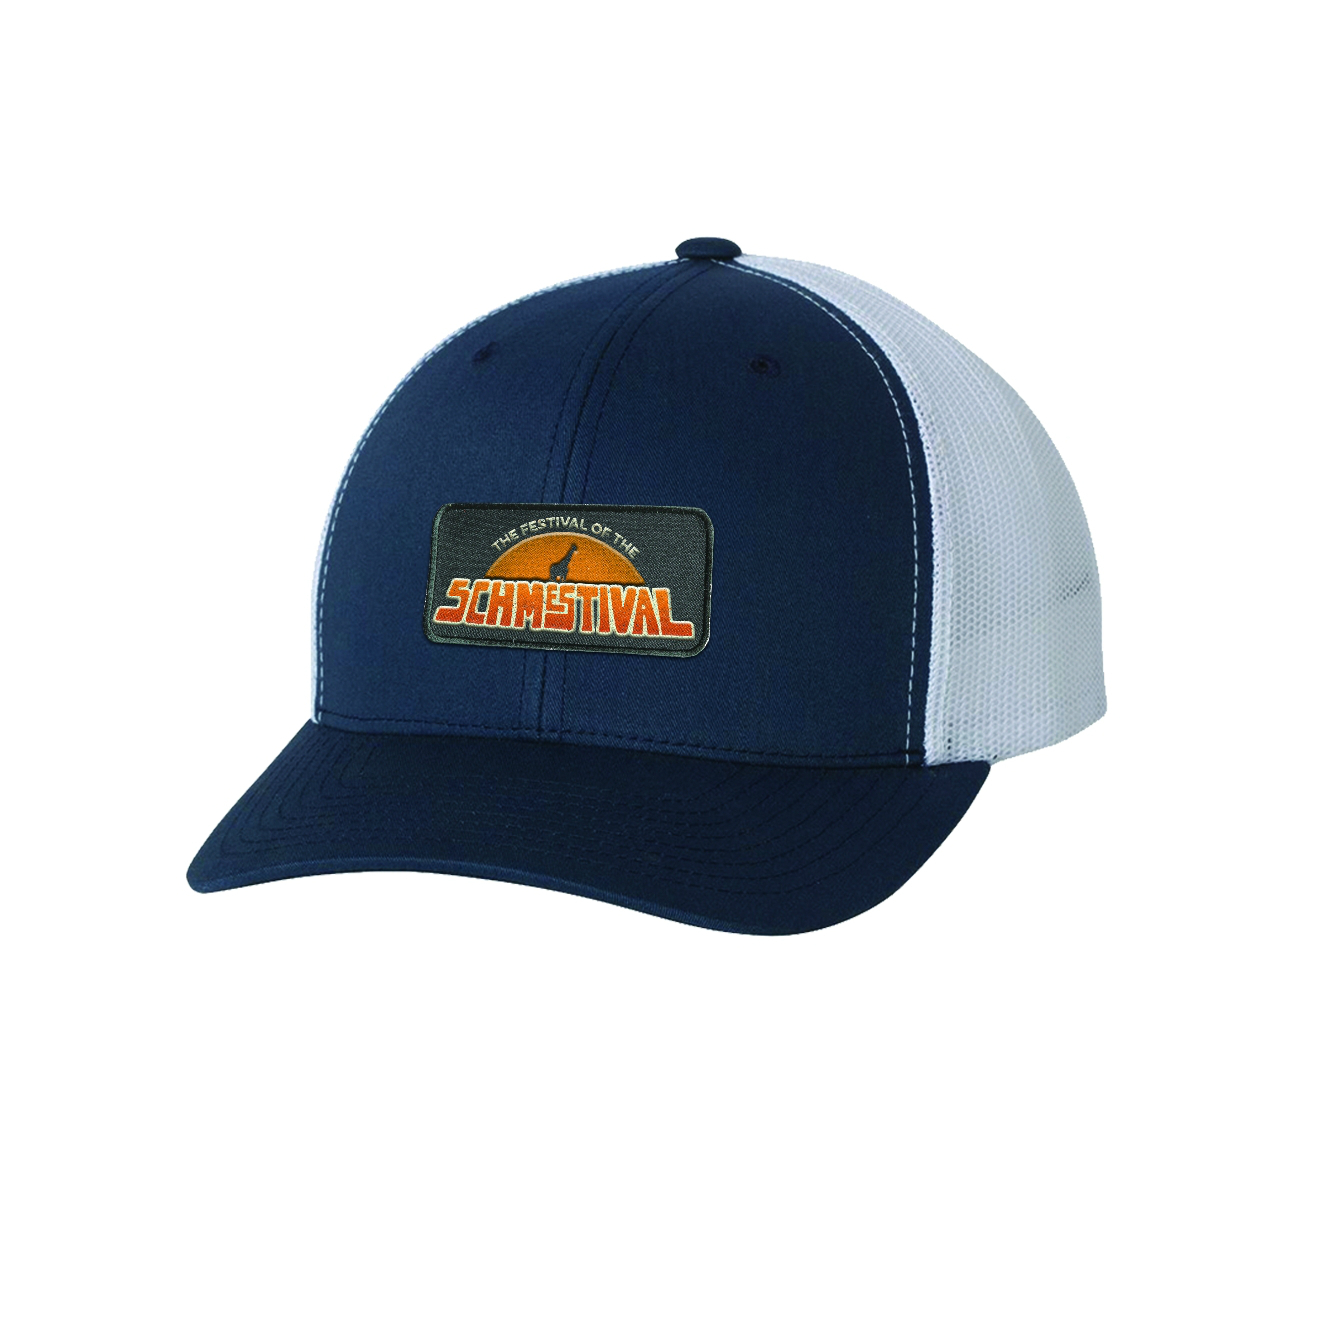 Schmestival Logo Trucker Hat Navy/White